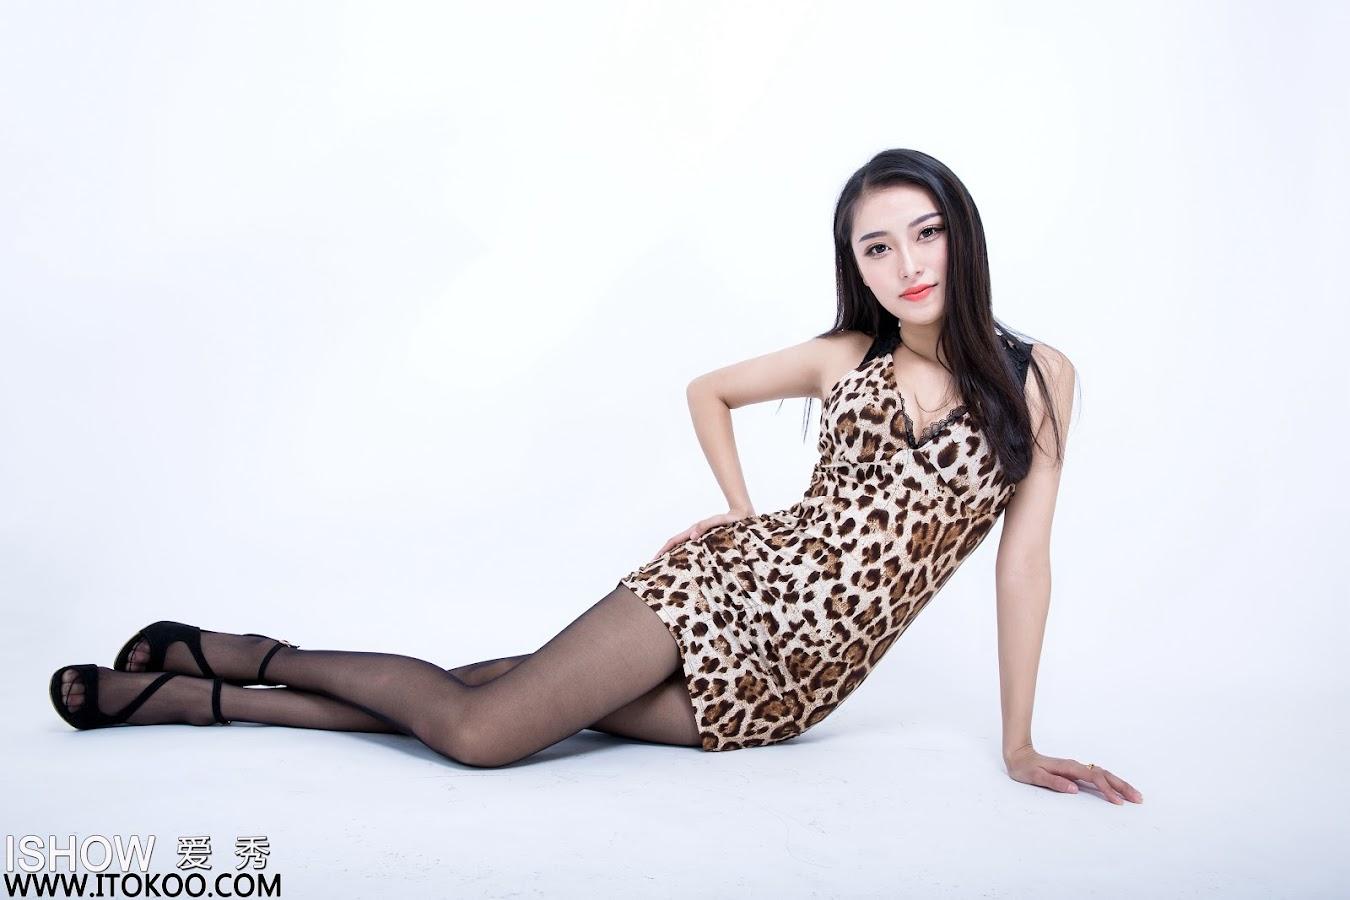 ISHOW No.025 Wang Yu Tong 王钰彤Kimi [36P173M]